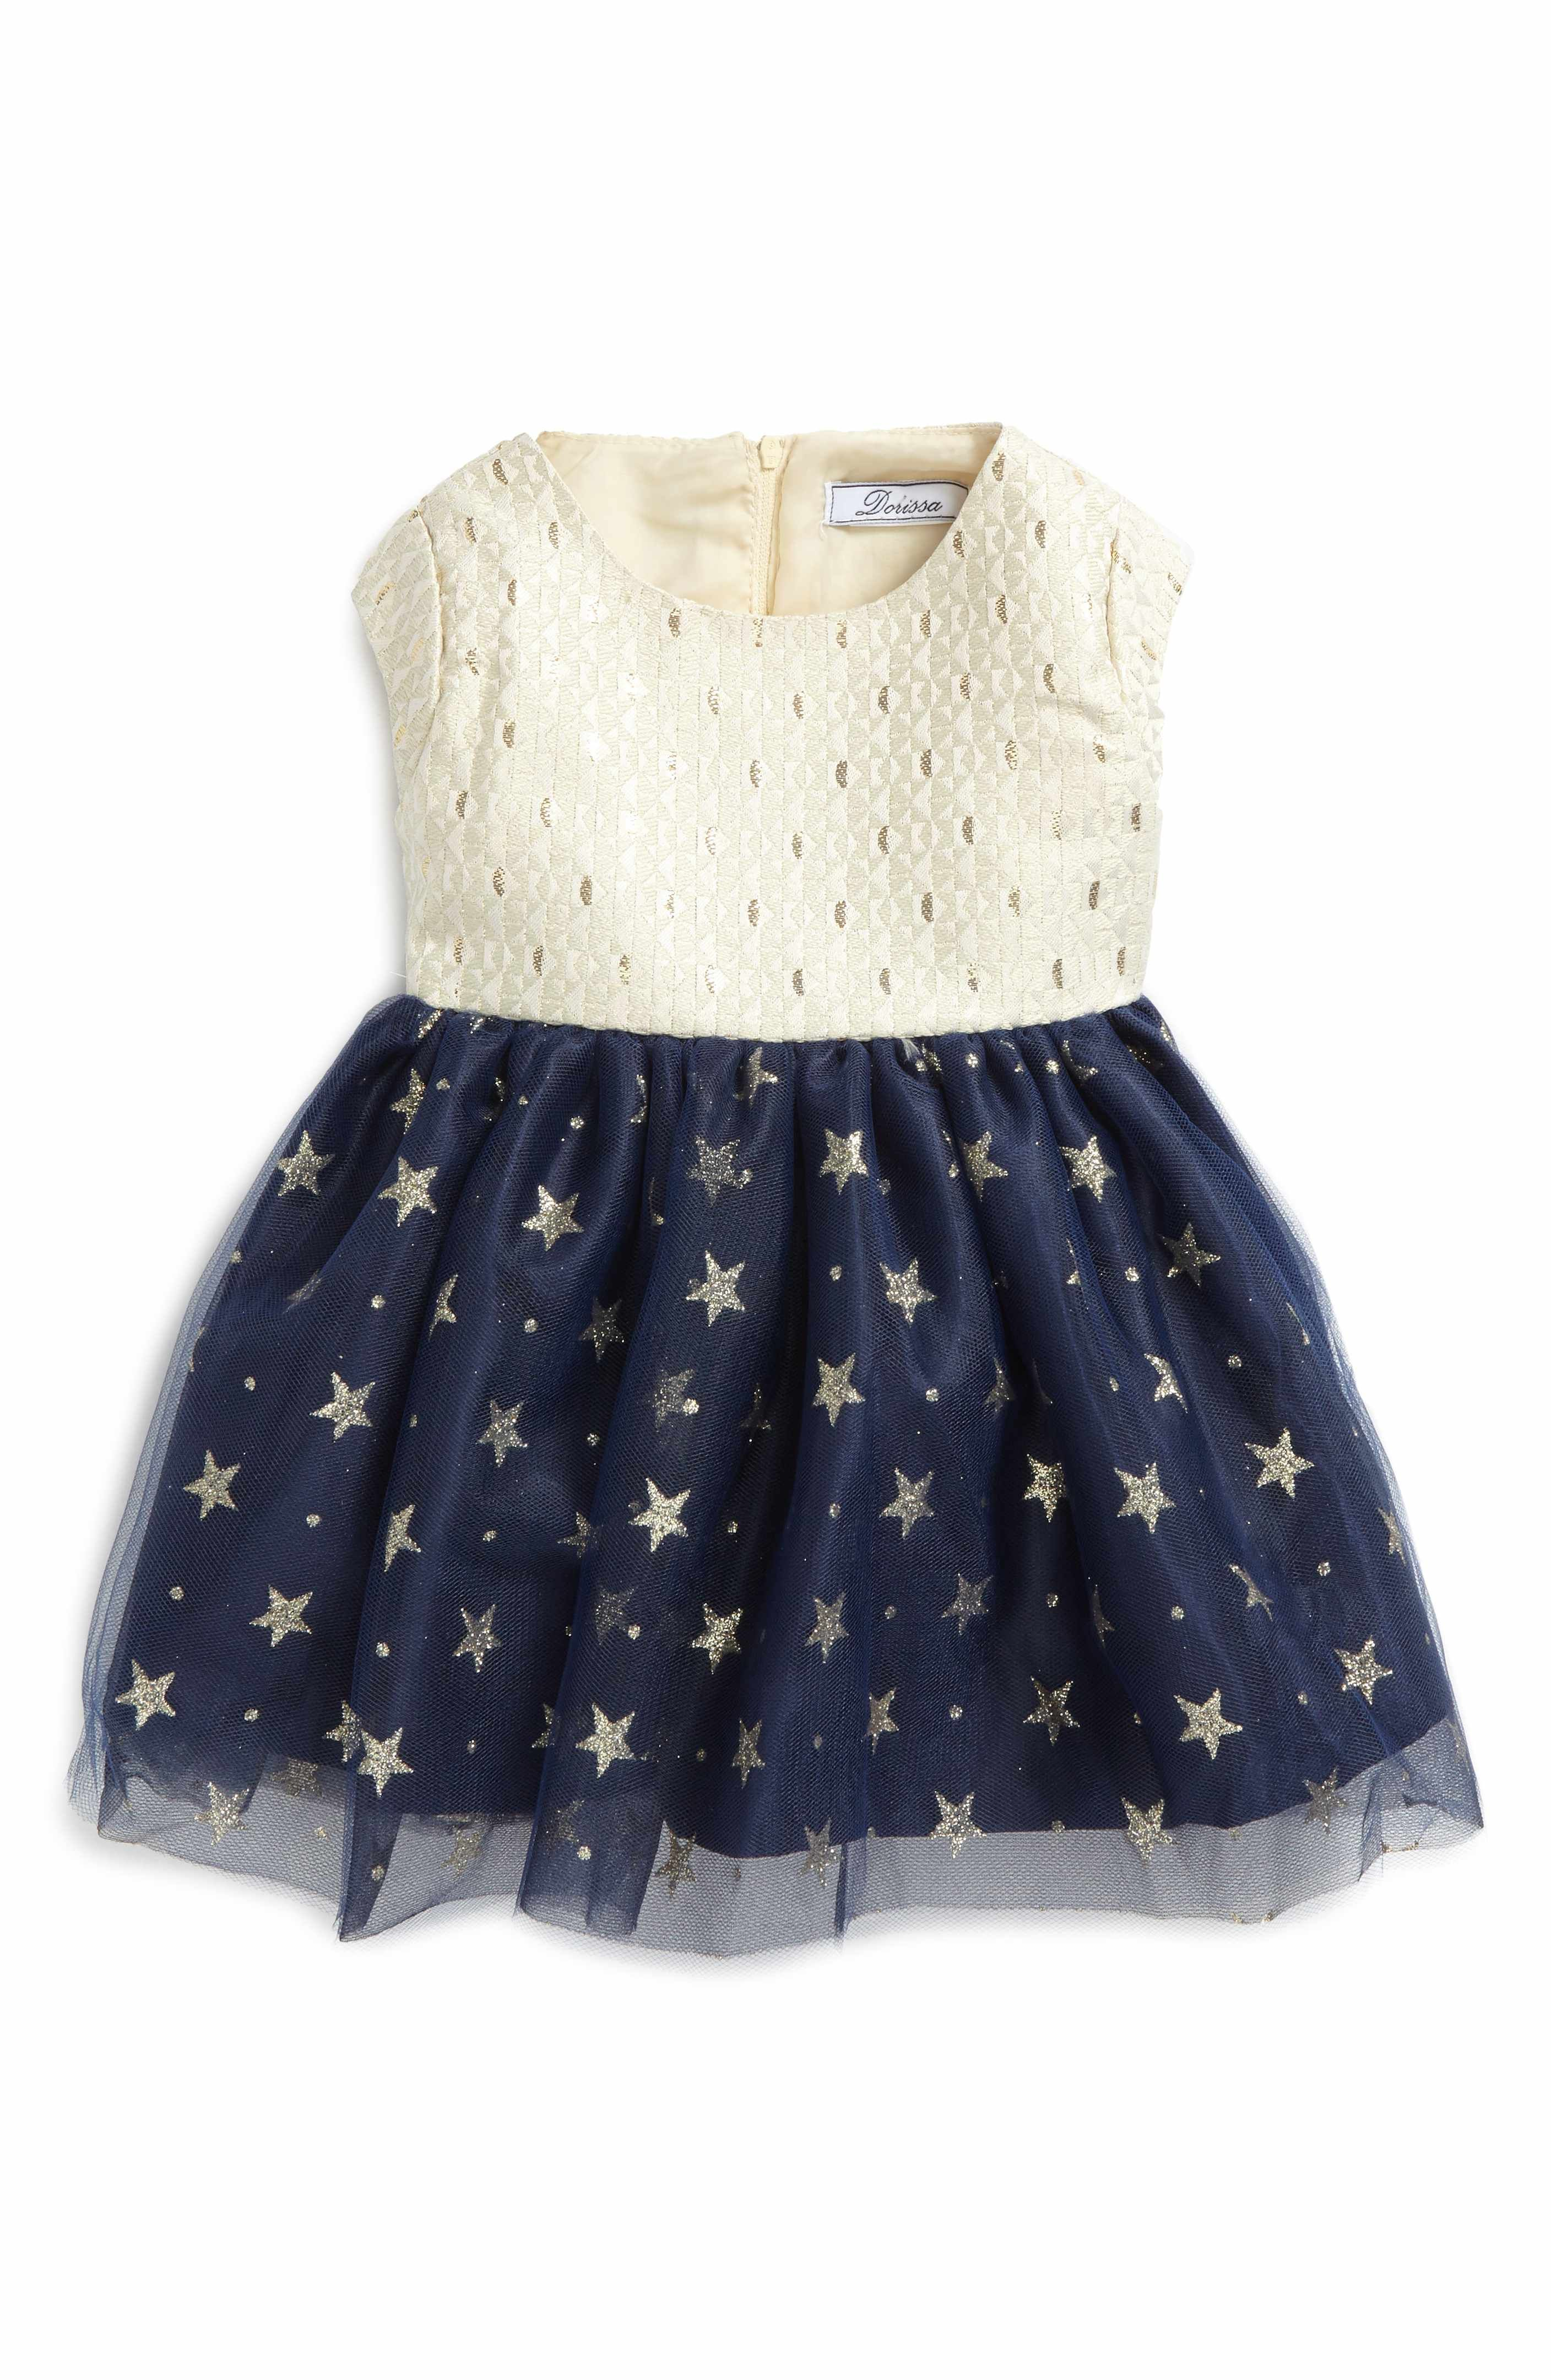 Main Image Dorissa Kerry Fit & Flare Dress Baby Girls